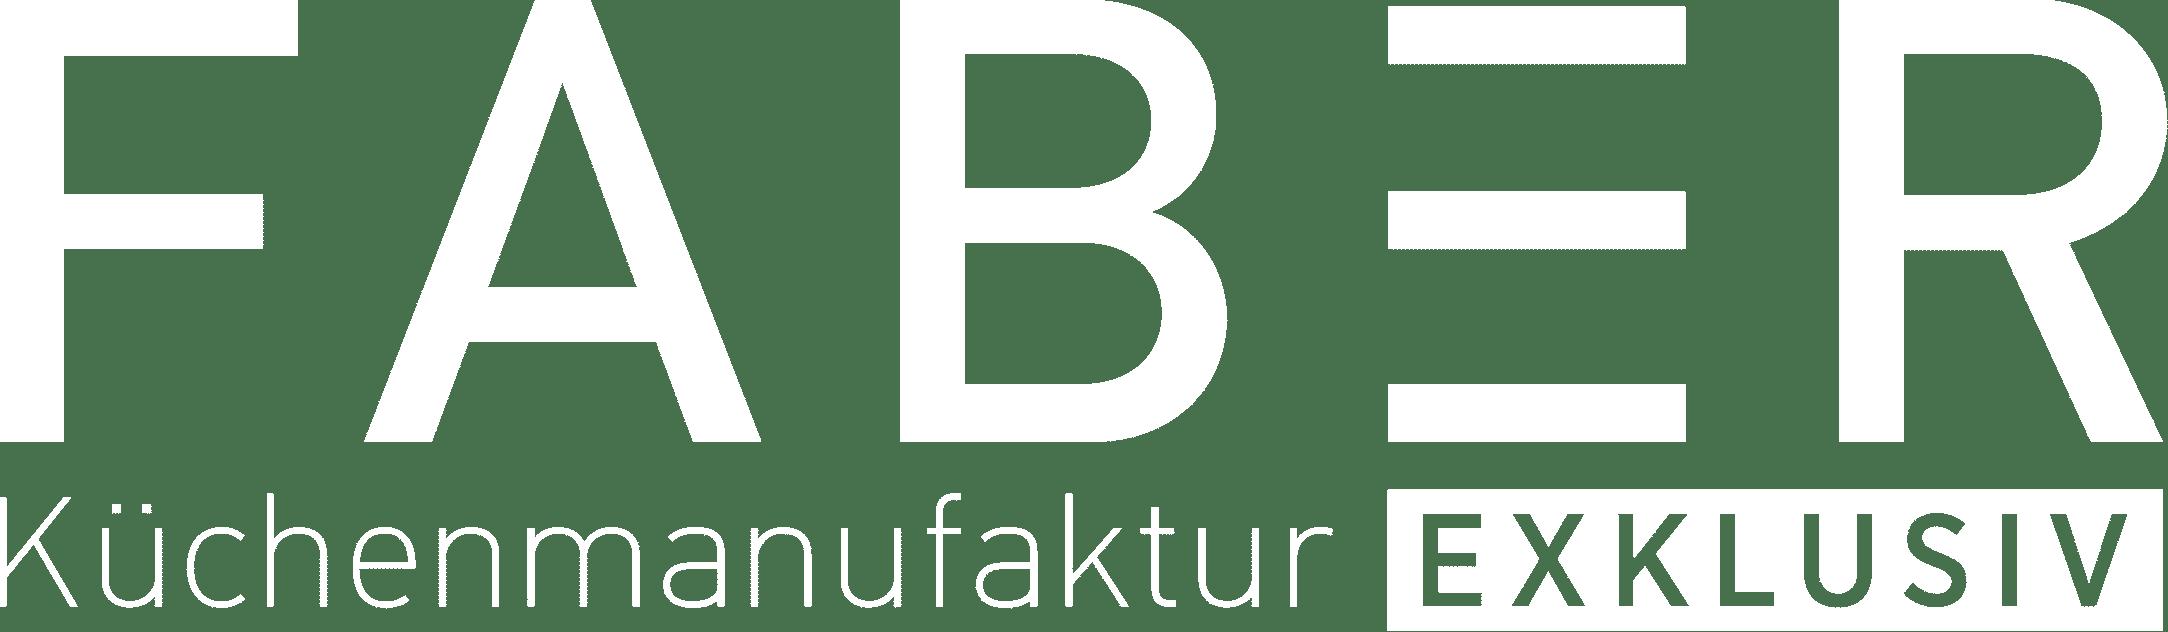 Faber Küchenmanufaktur